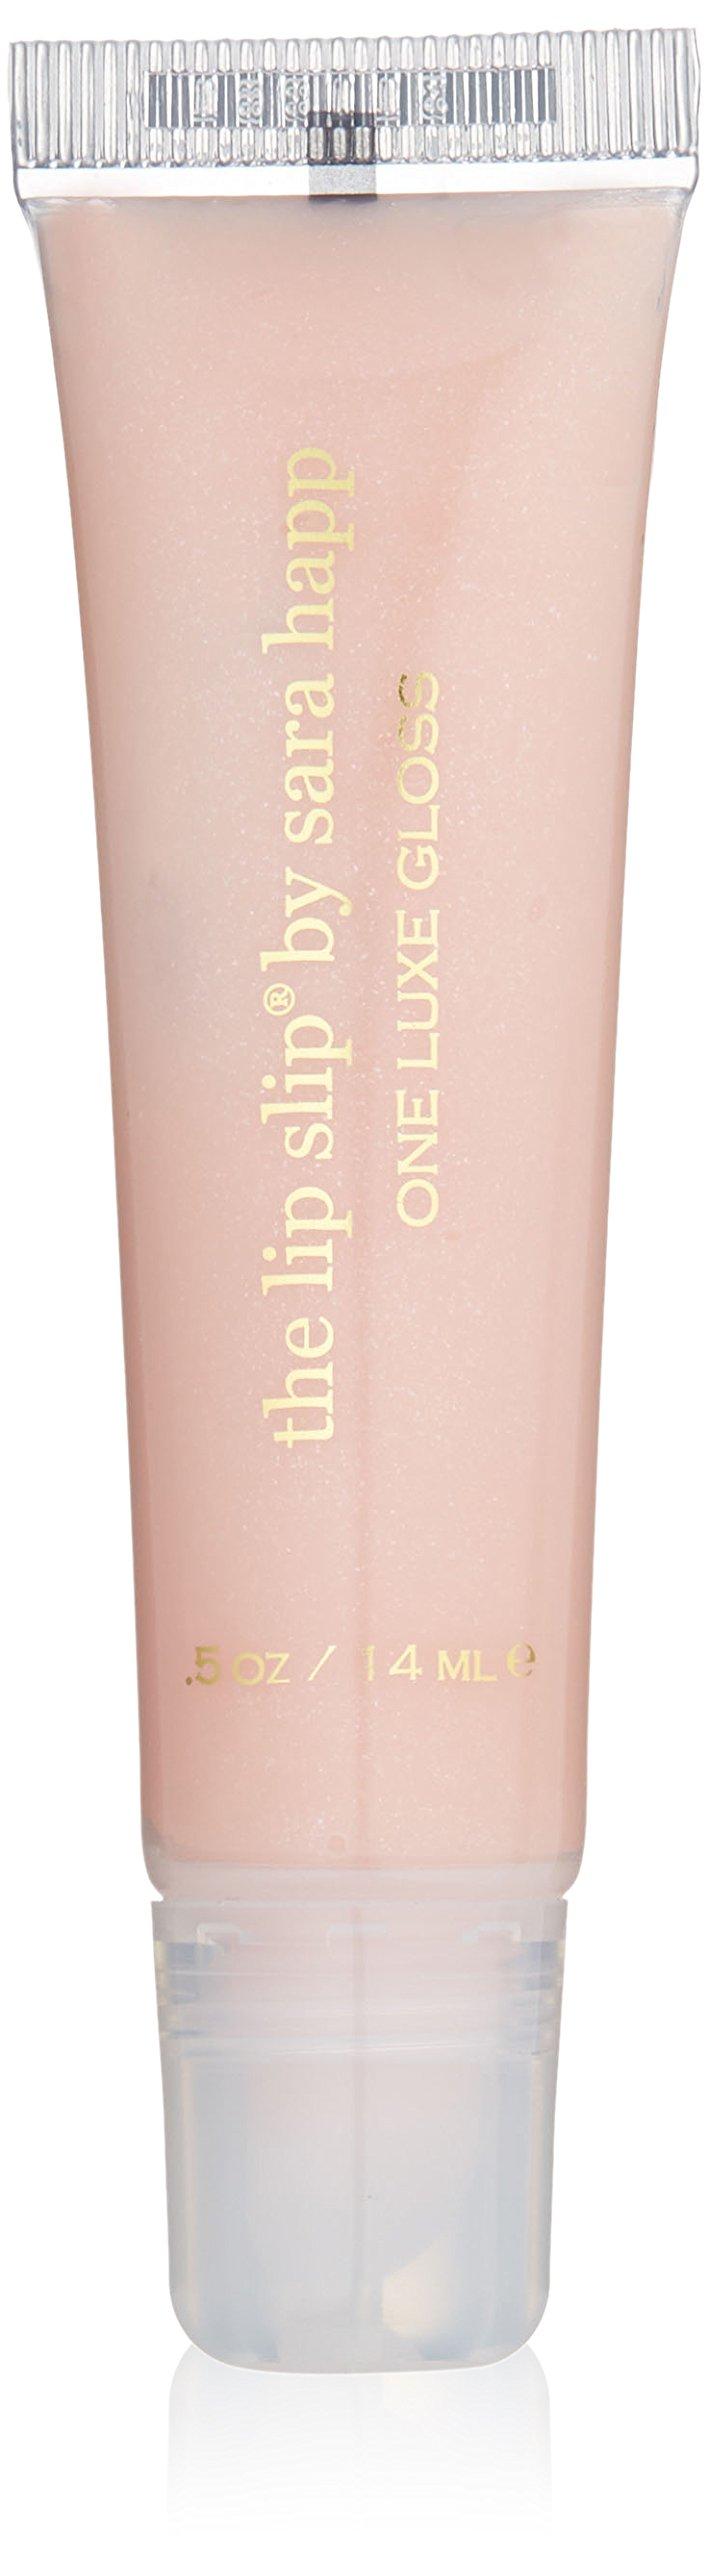 Sara Happ The Lip Slip: One Luxe Gloss - 0.5 oz